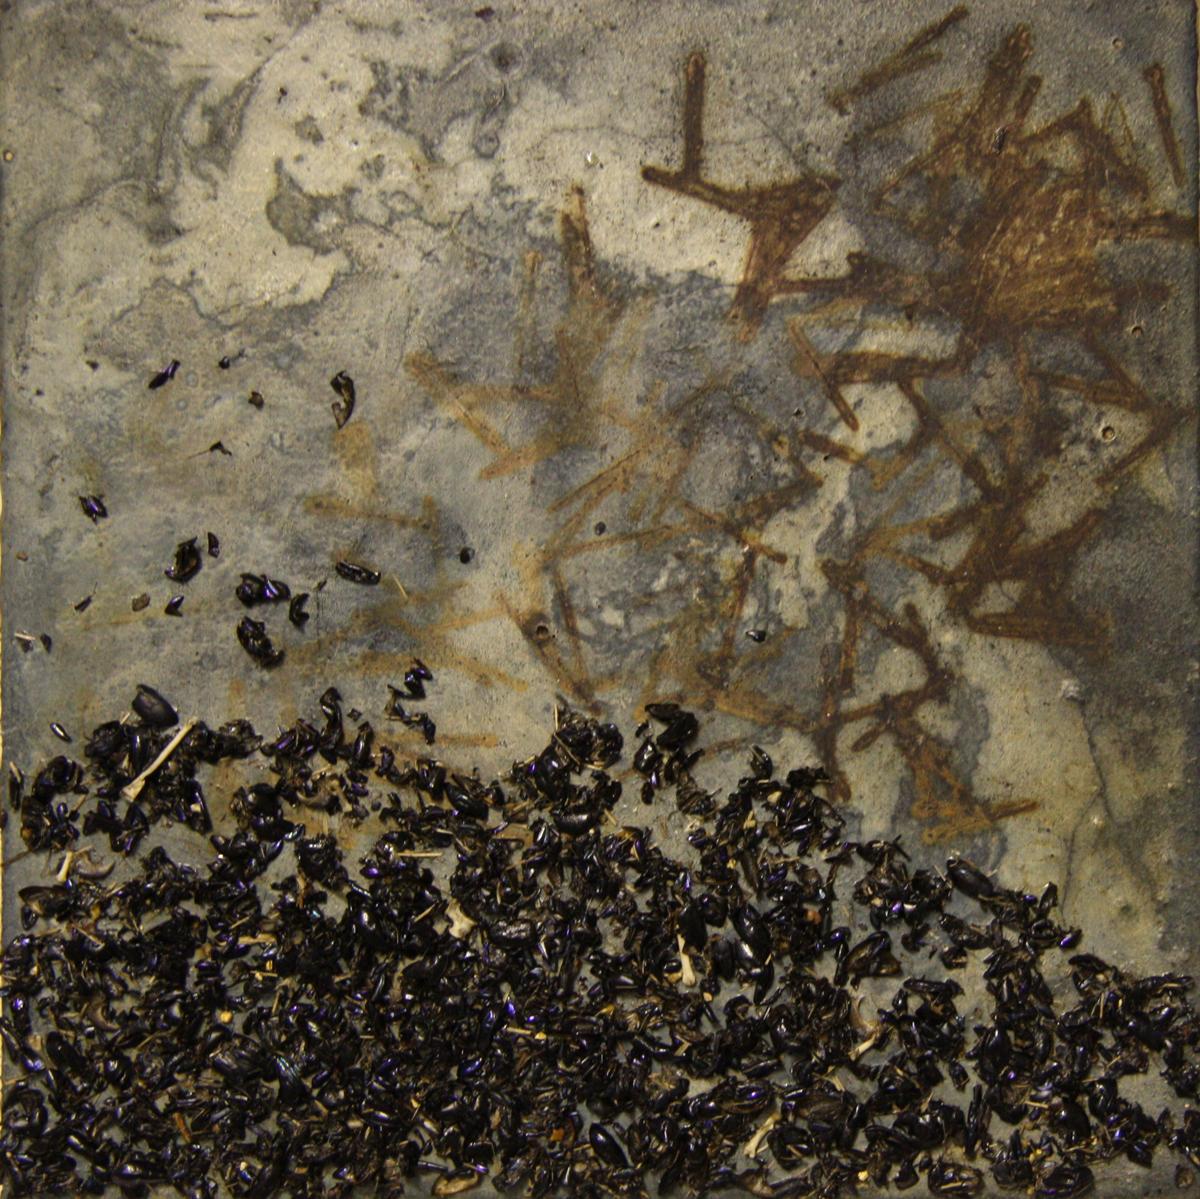 Urban Fox, Rural Fox (2012), Fiona Long, fox shit, rust, genuine indigo, and concrete on canvas, 30 x 30 cm